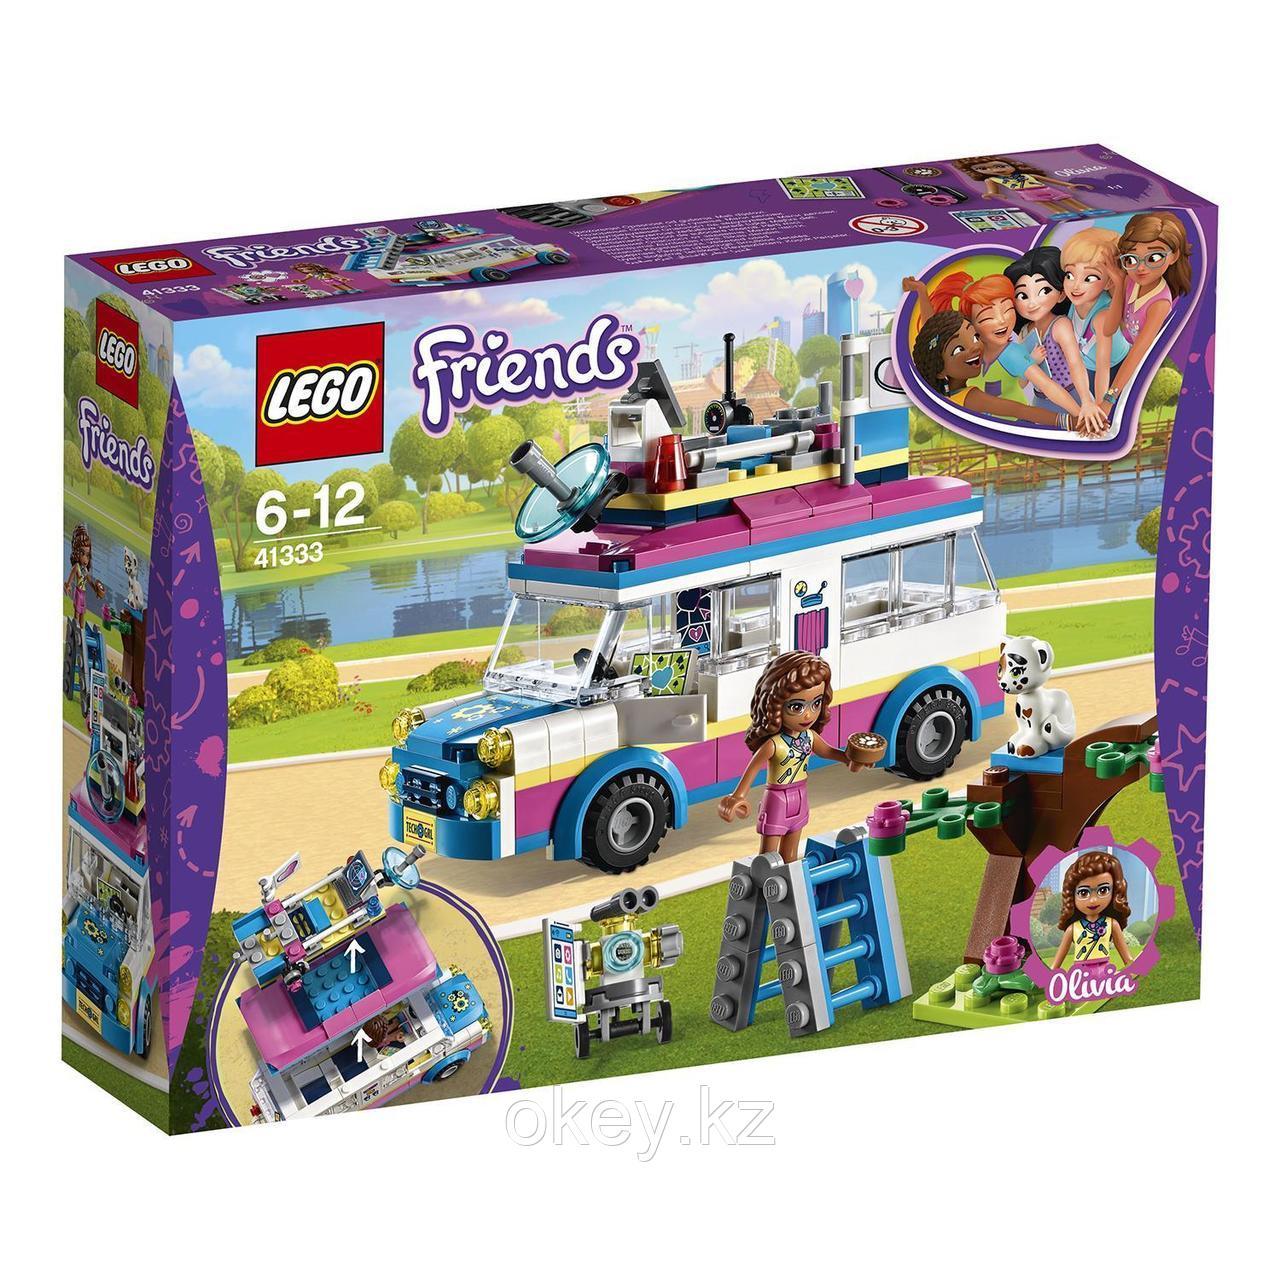 LEGO Friends: Передвижная научная лаборатория Оливии 41333